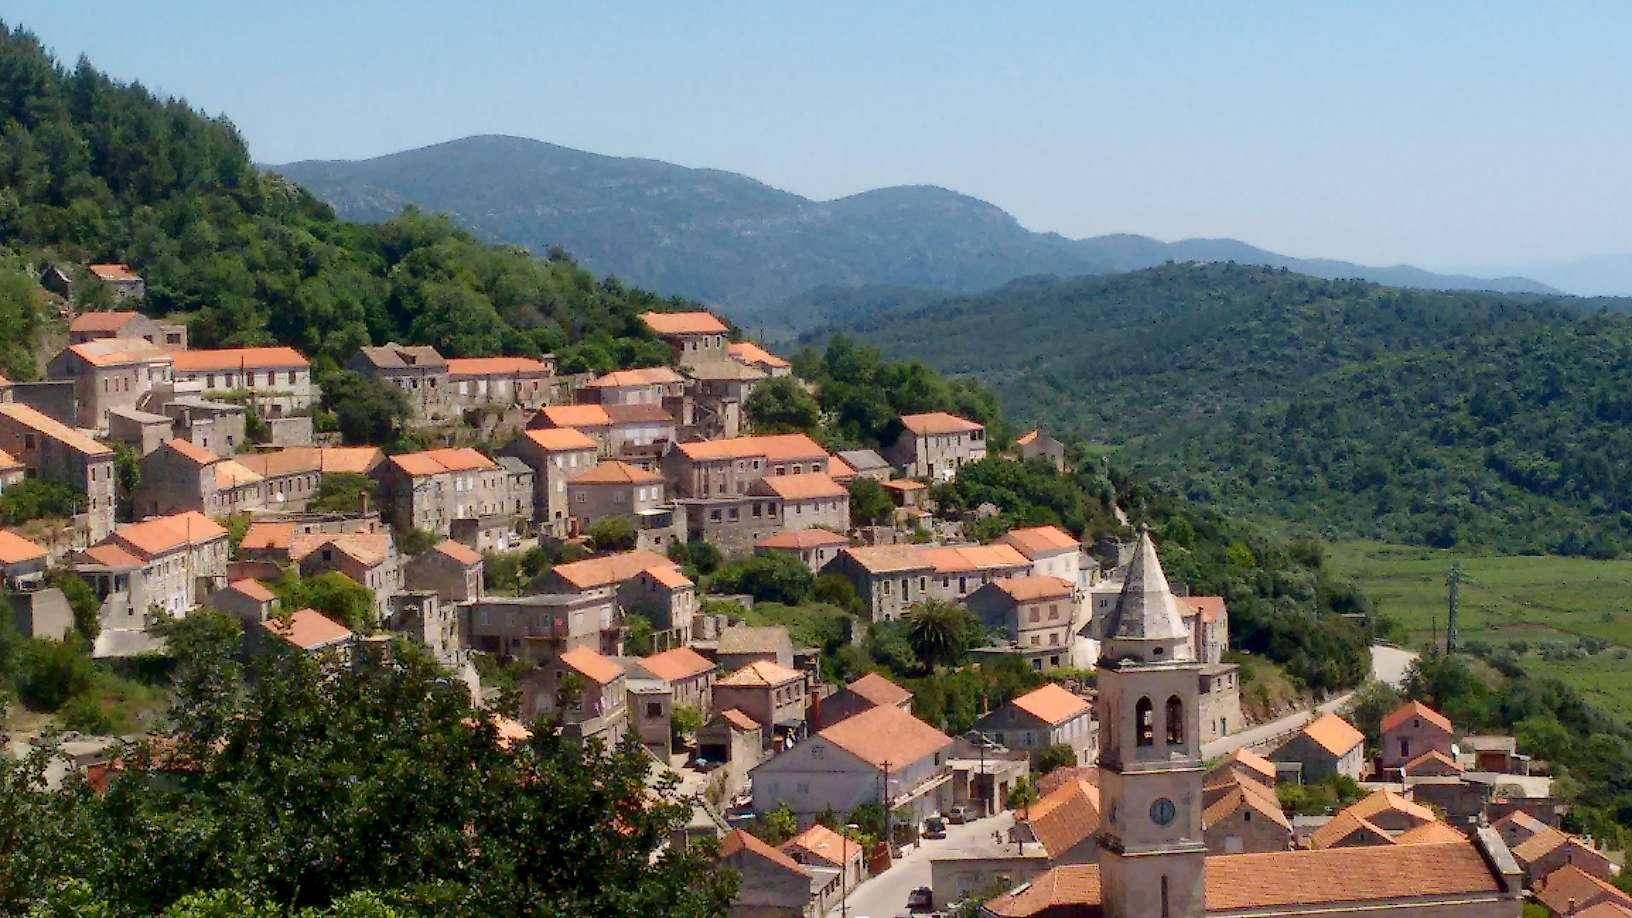 Overlooking the city of Ston, Croatia.